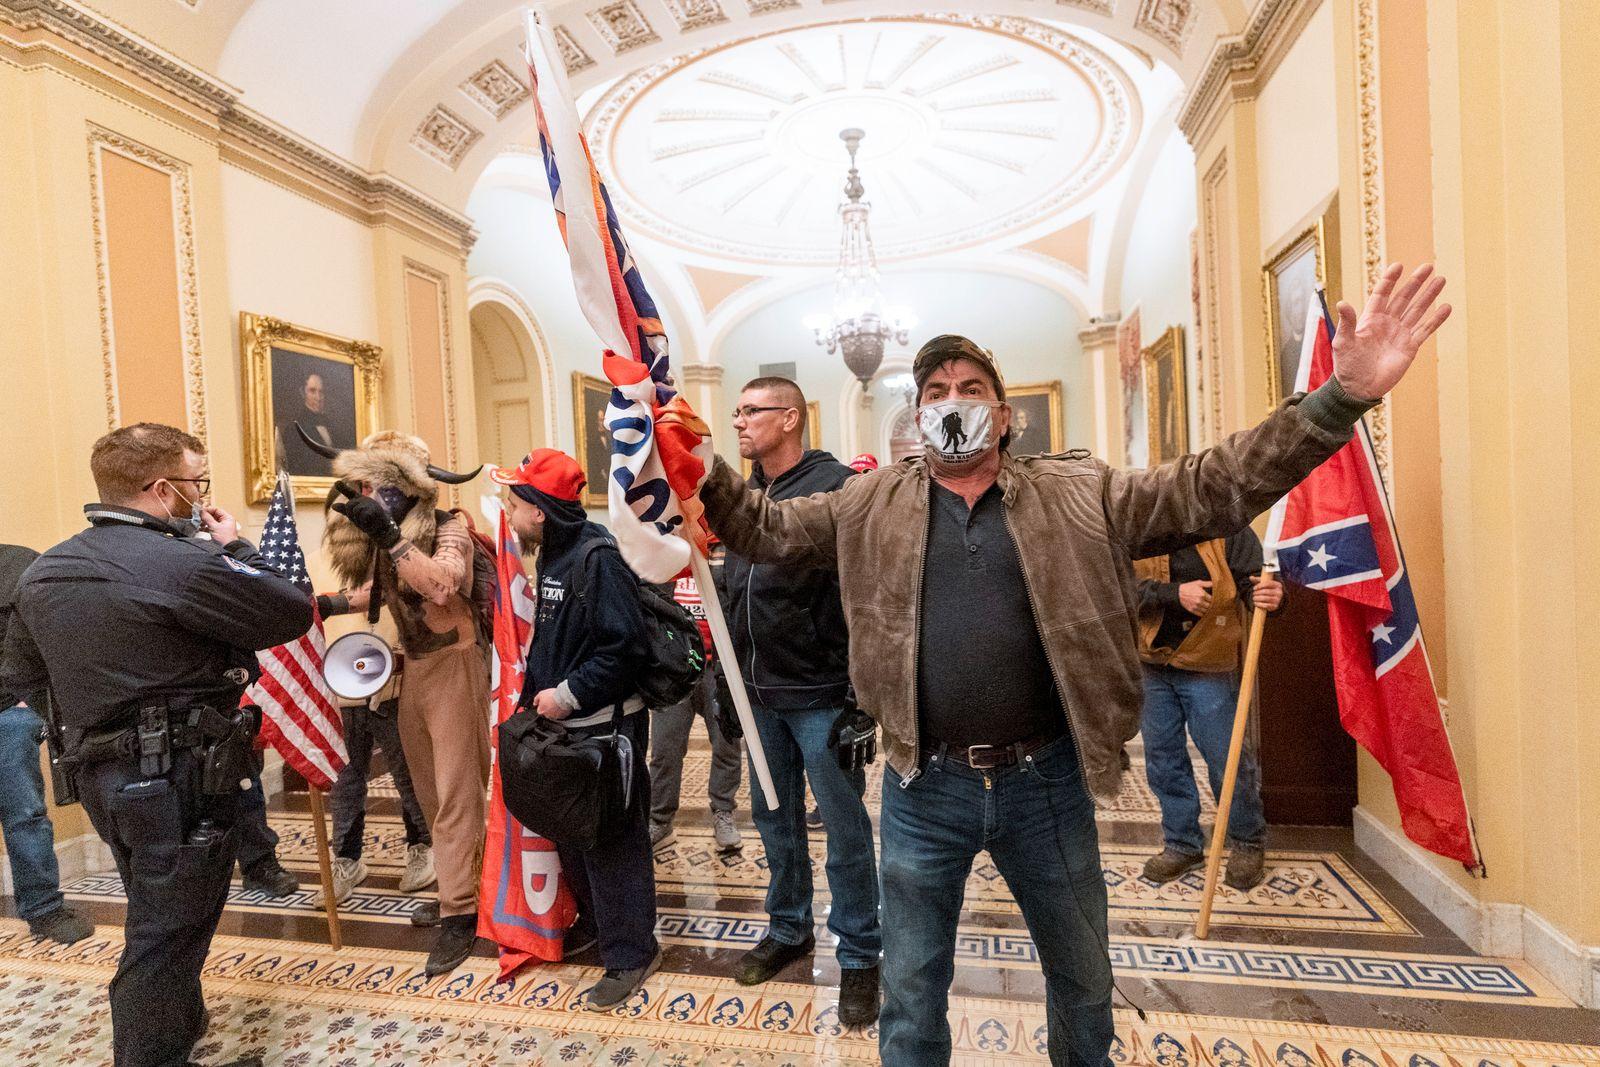 Capitol Breach Racist Symbols